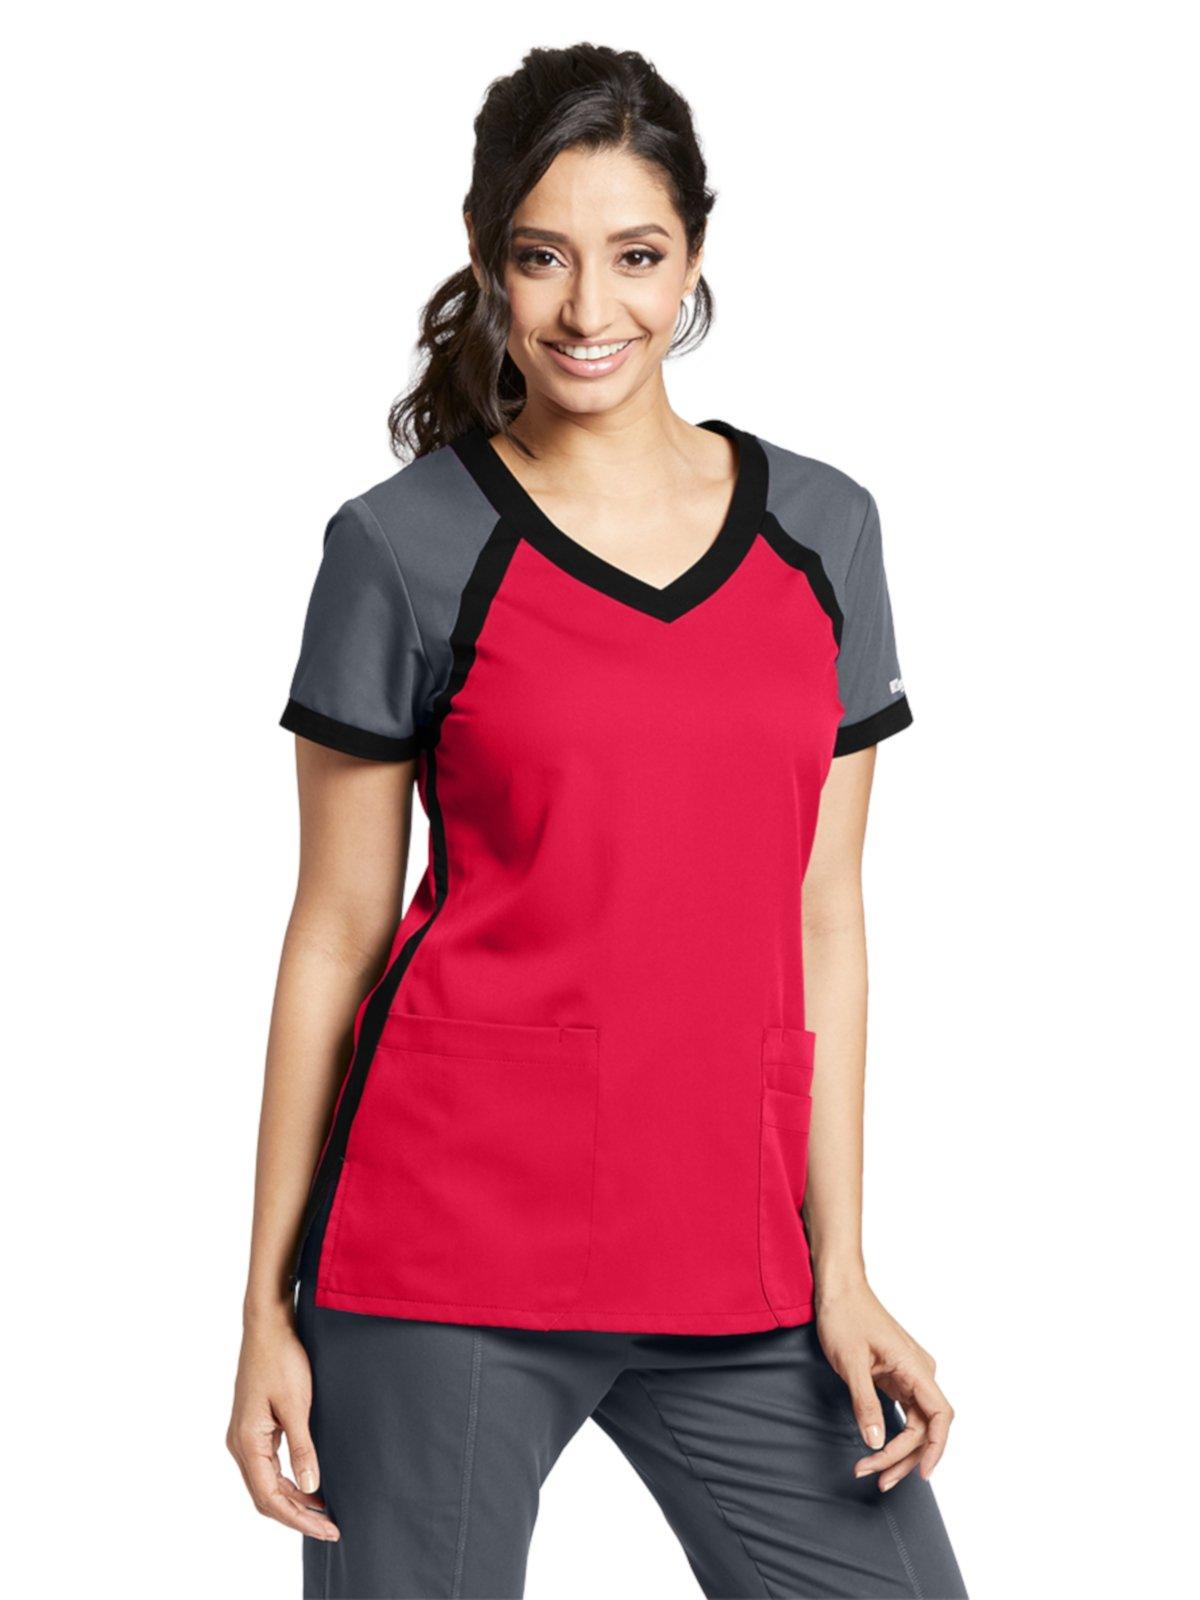 Grey's Anatomy Active 41435 Color Block V-Neck Top Scarlet Red/Granite/Black M